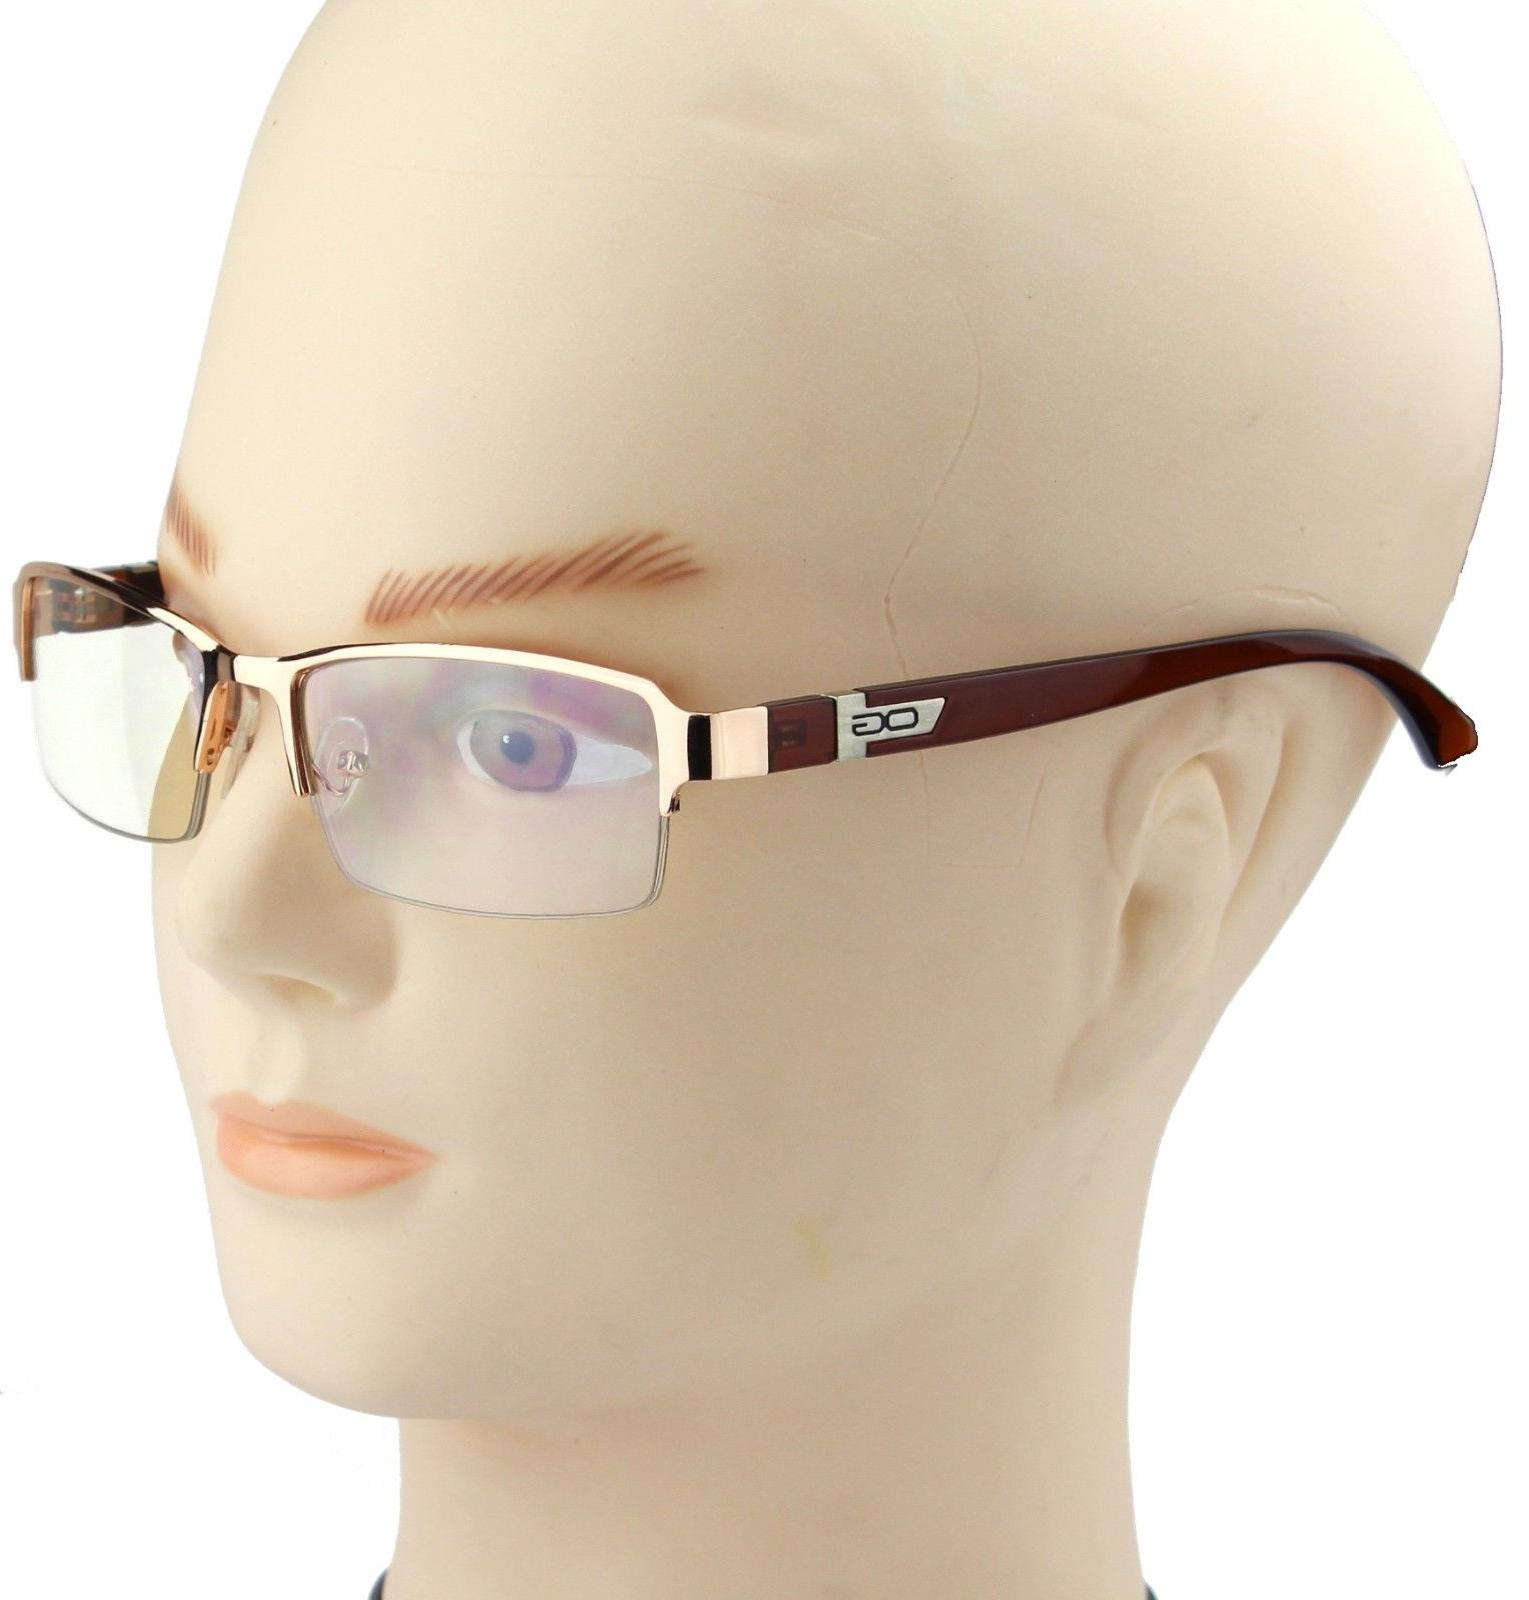 Half Eyewear Clear Lens Eye Glasses Nerd